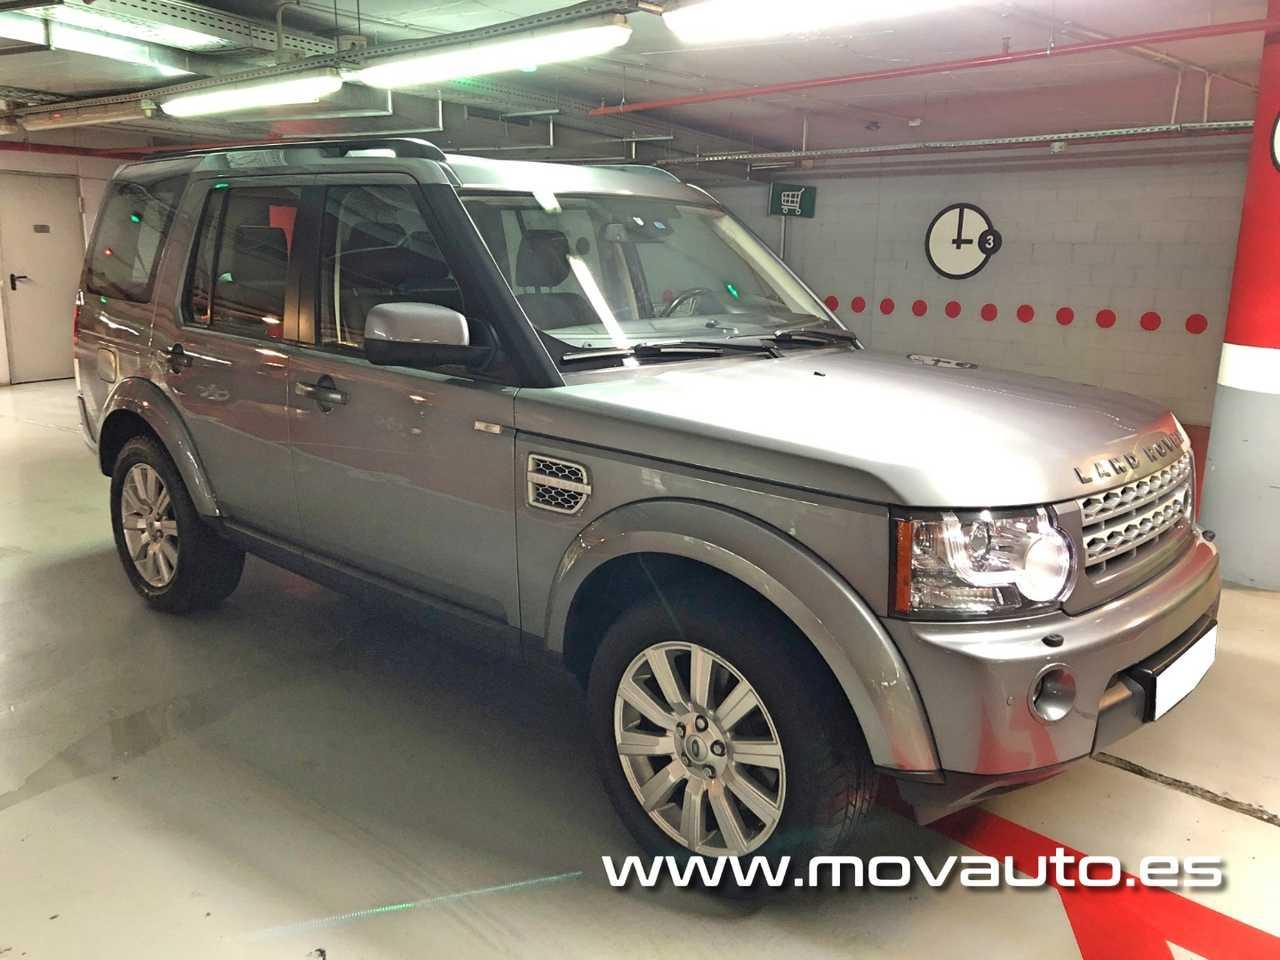 Land-Rover Discovery 4 3.0 SDV6 HSE 255cv 7pz   - Foto 1